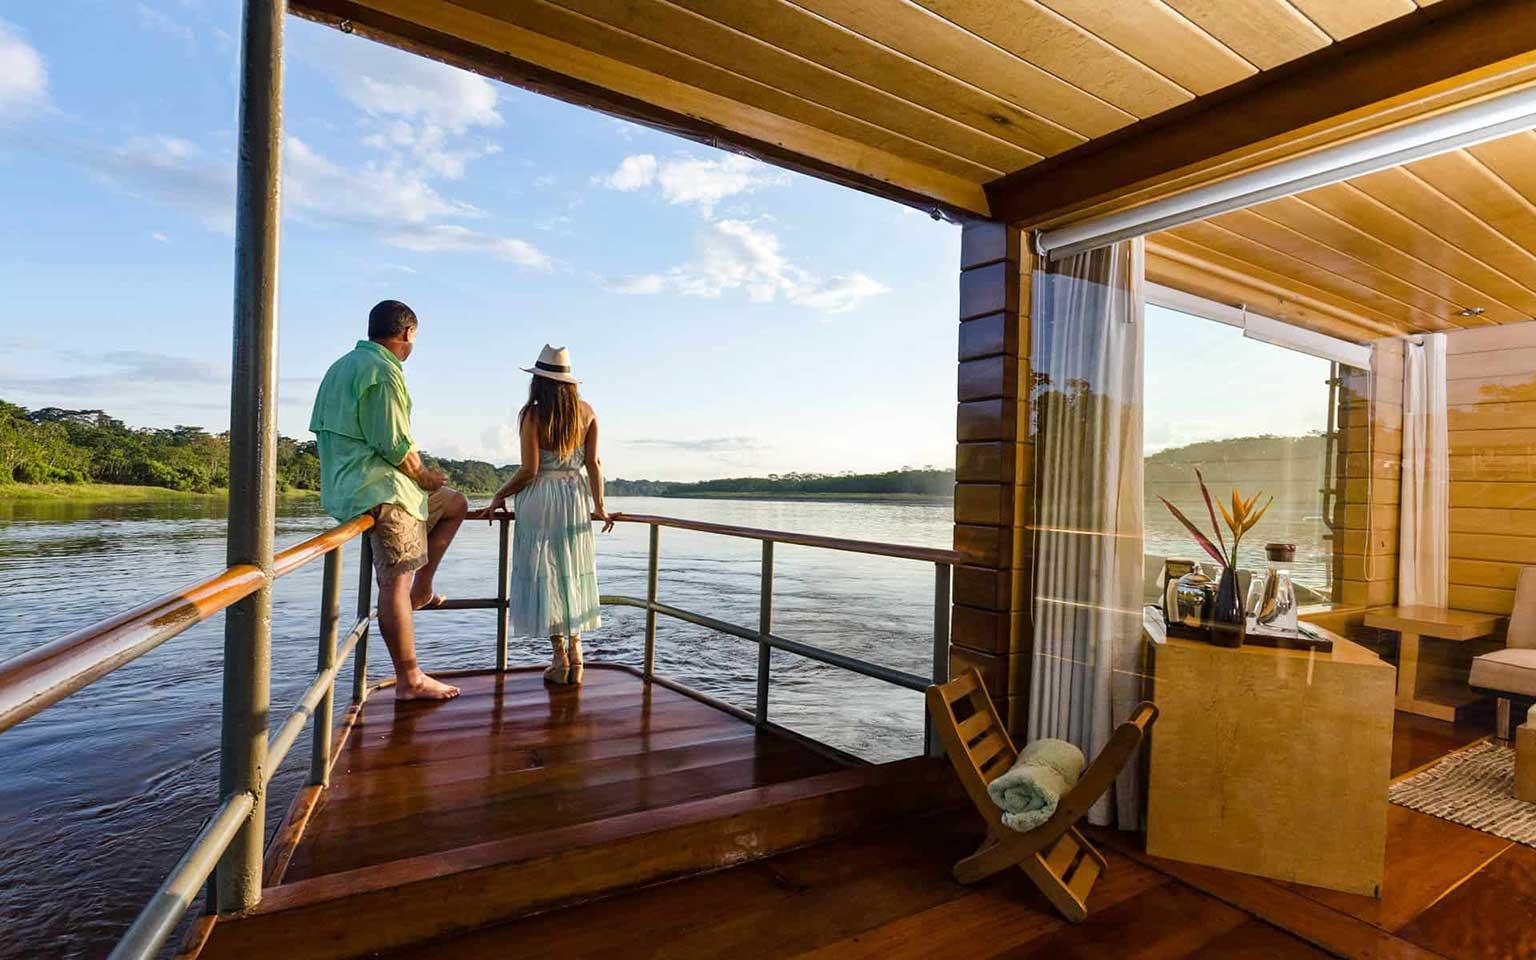 Delfin-Amazon-River-Cruise-tour-leaders--travel-2023